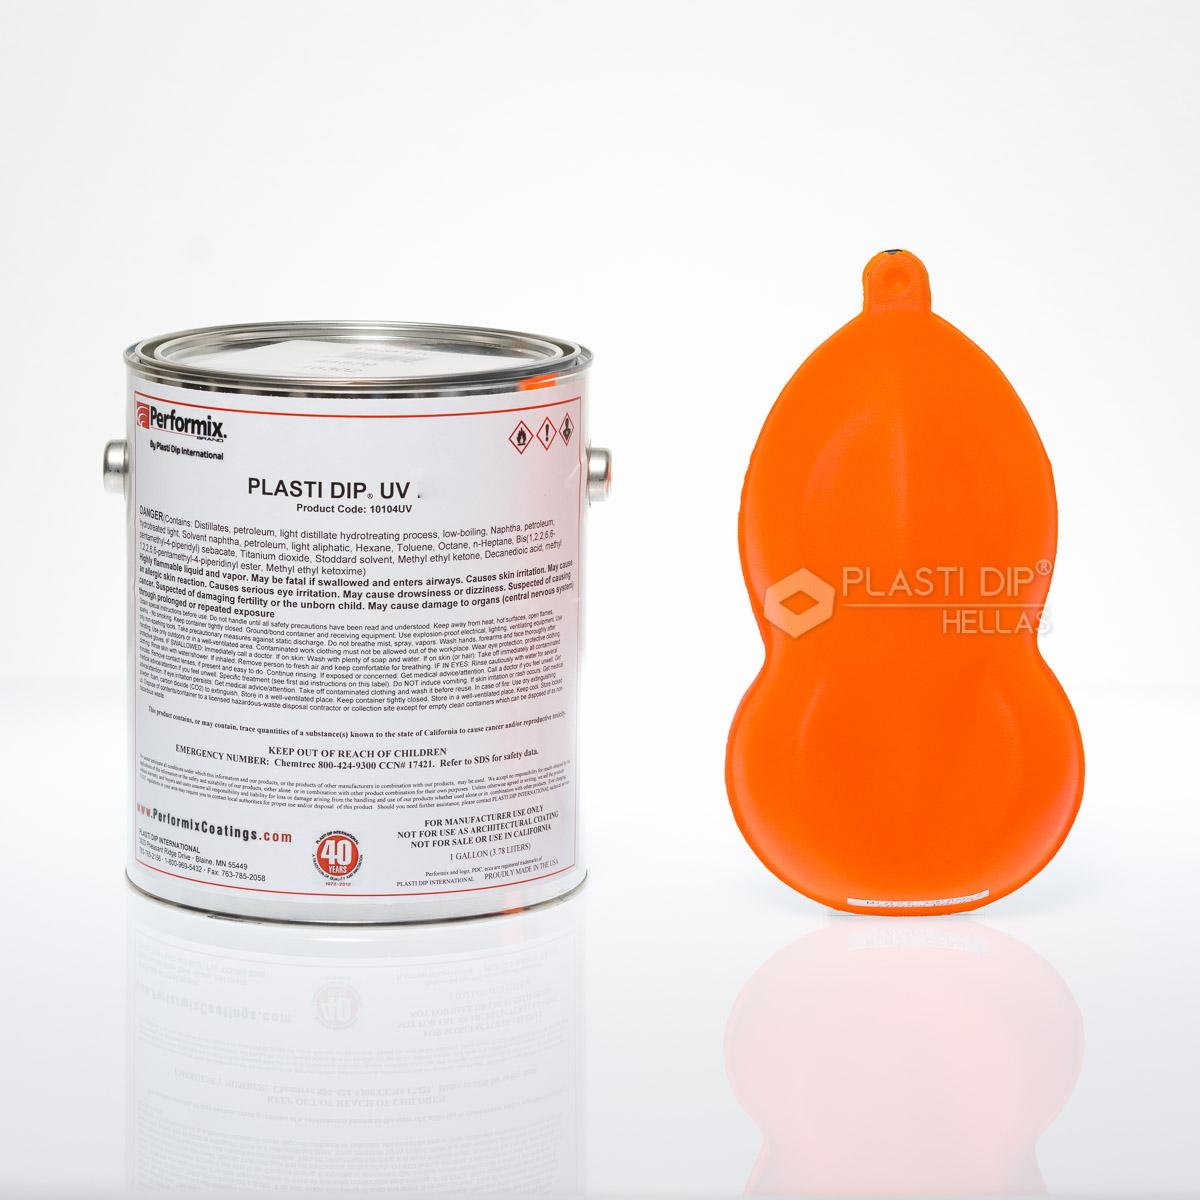 Plasti dip σε Υγρή μορφή Fluorescent Orange Unthinned(παχύρευστο)